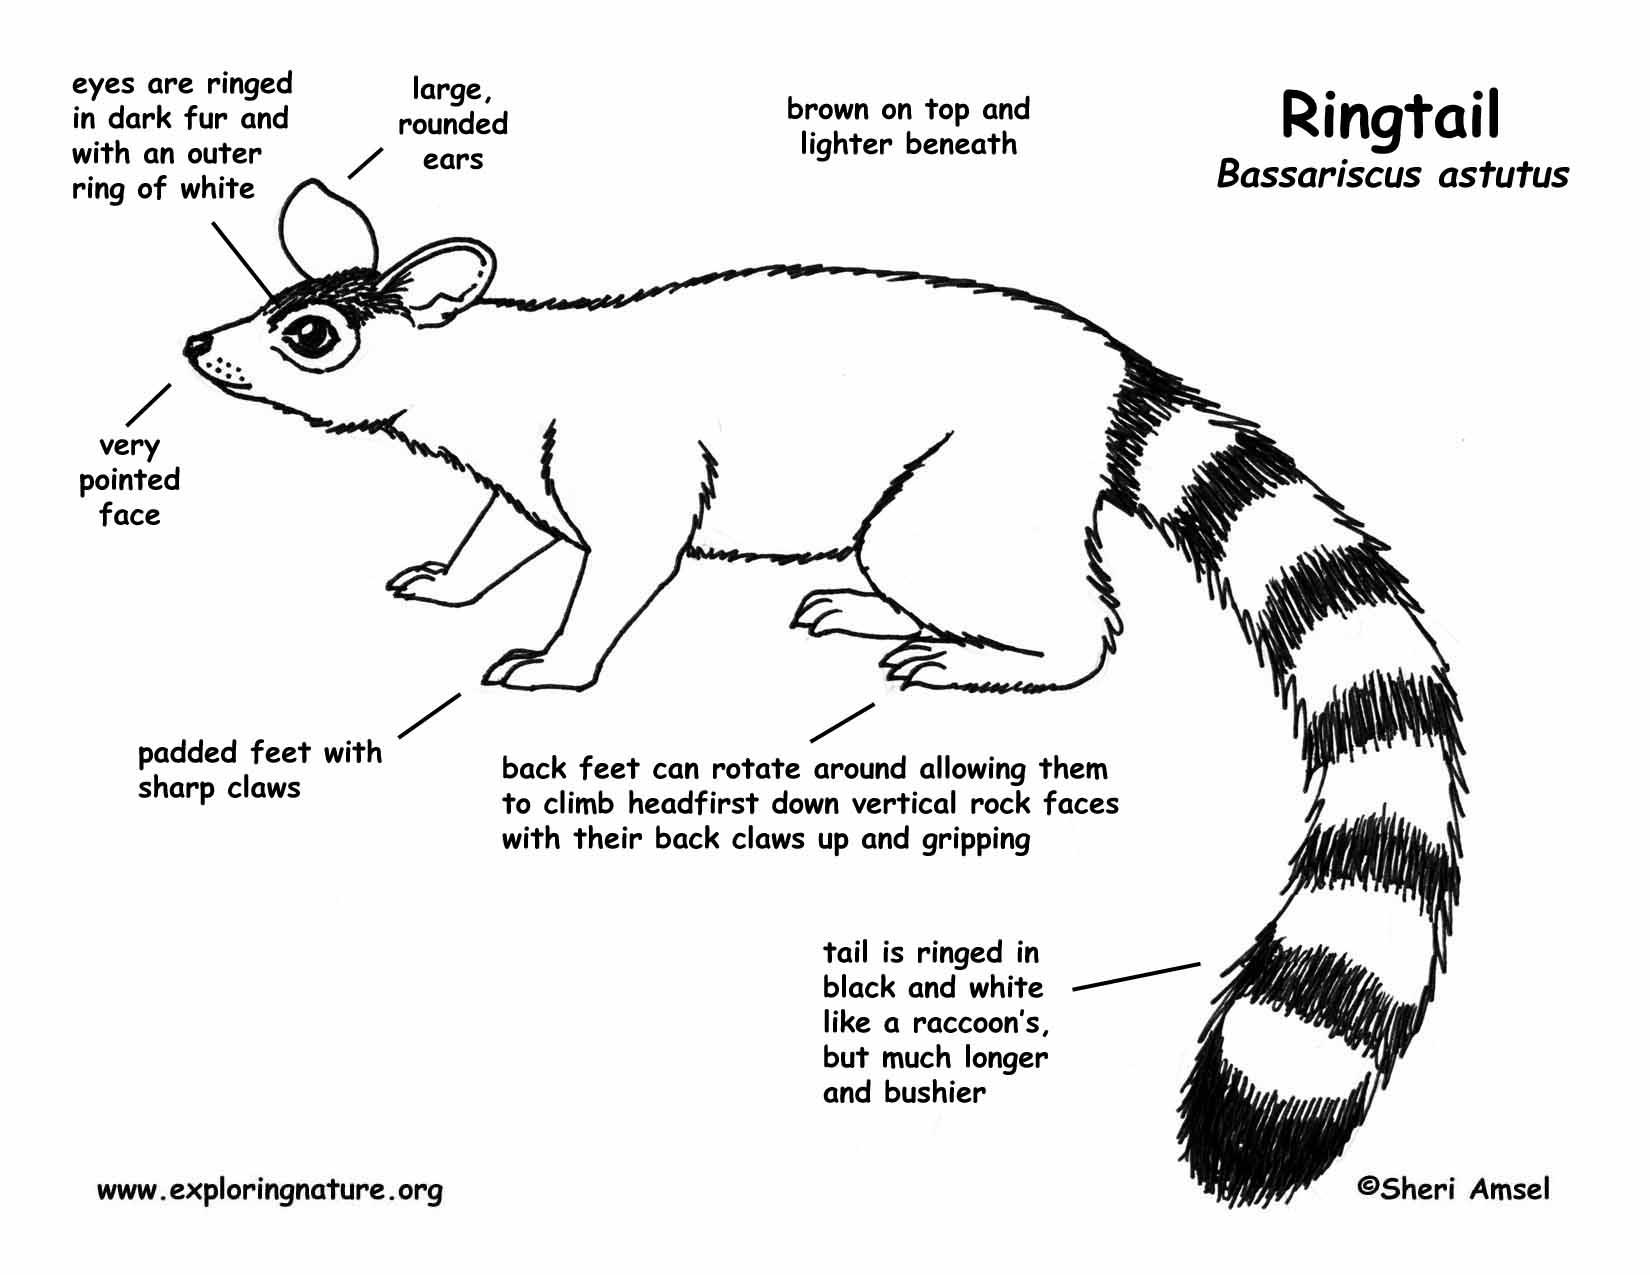 ringtail